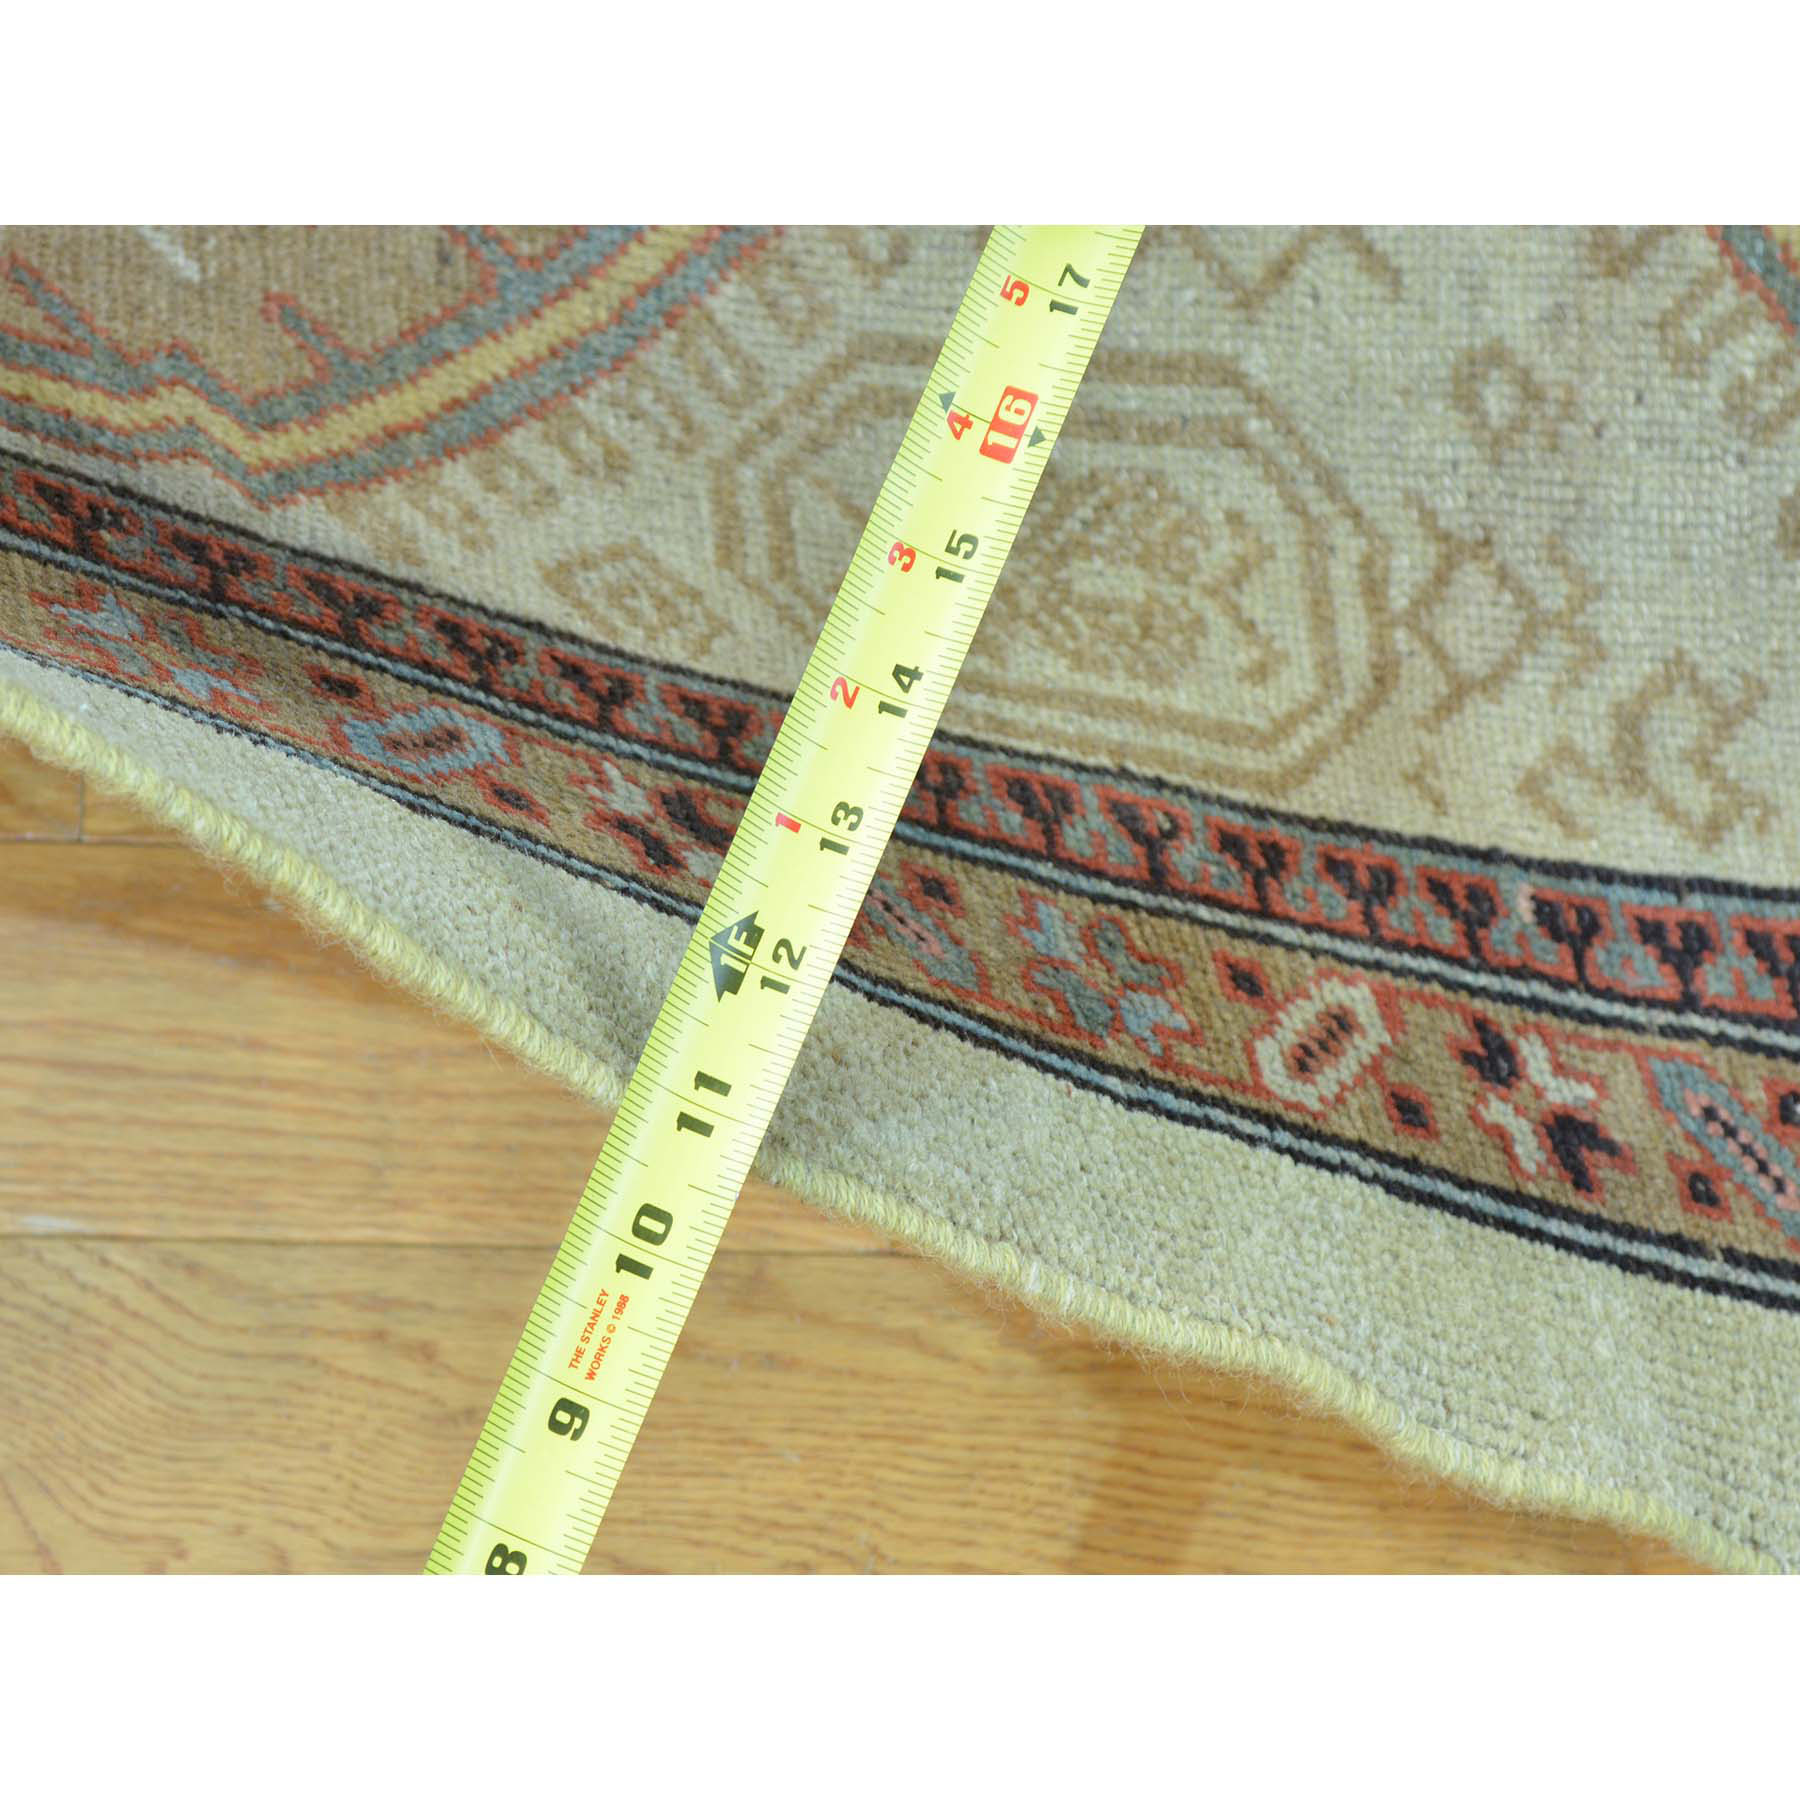 3-1 x14-3  XL Runner Antique Persian Serab Mint Cond Pure Wool Rug